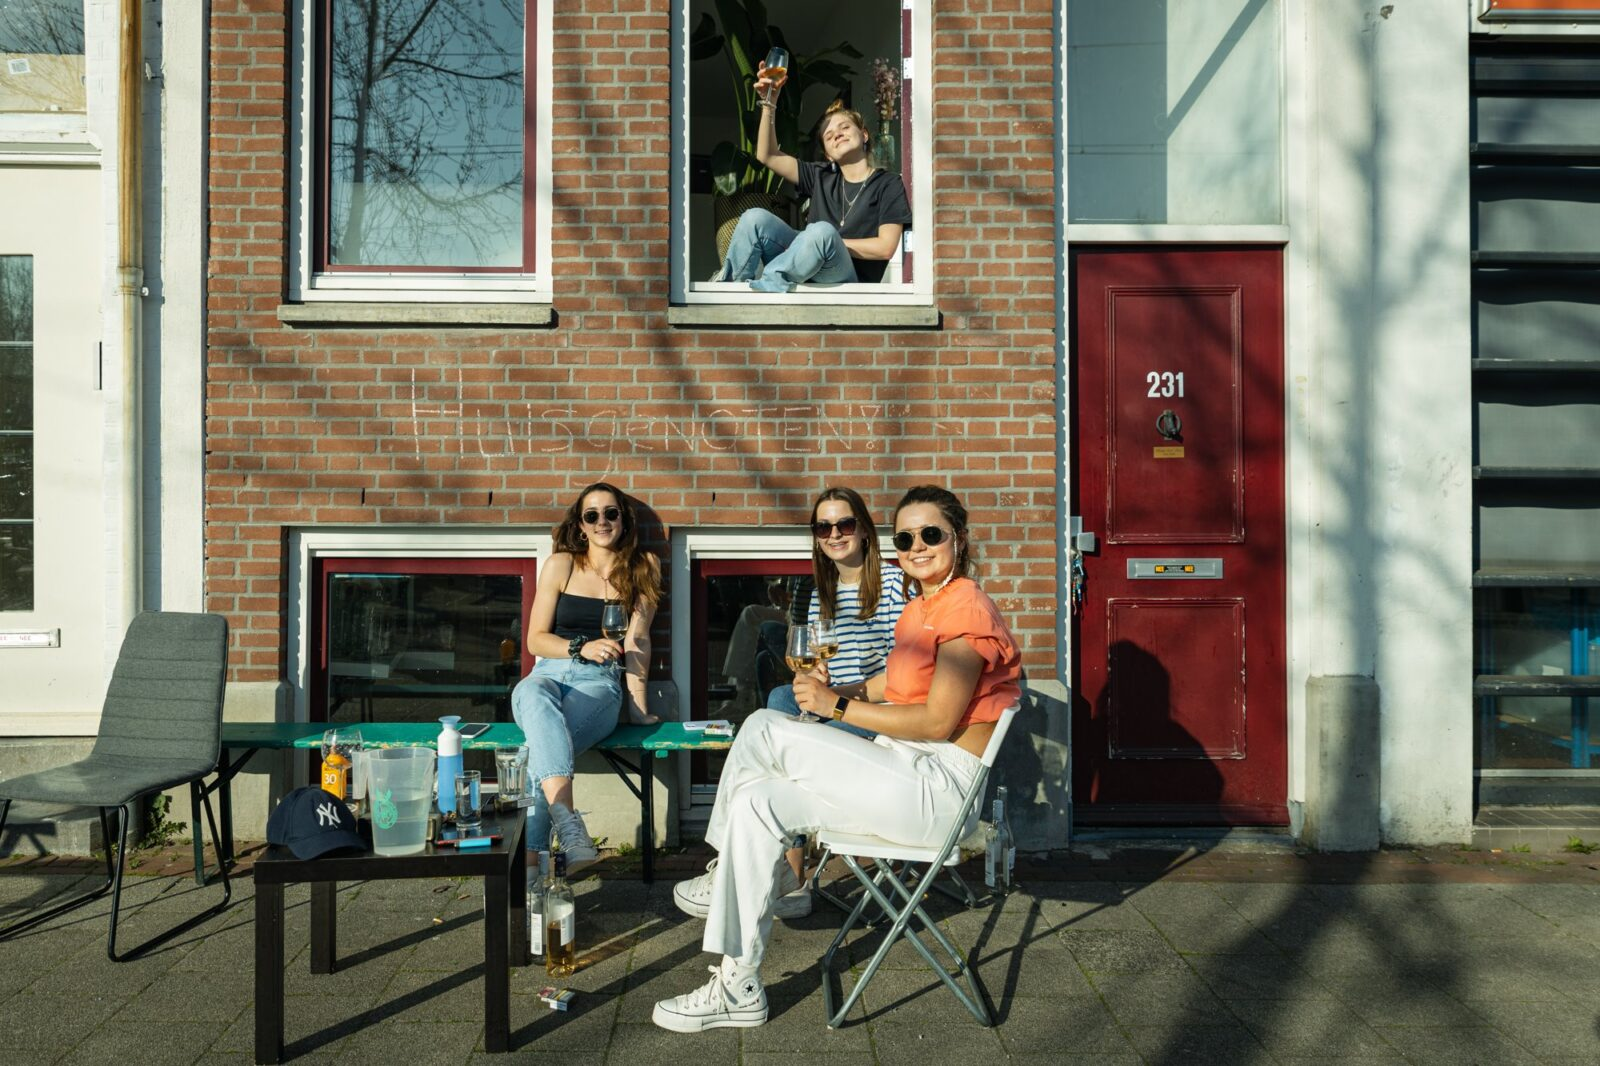 Lenteweer – Wouter Sterrenburg – Erasmus Magazine (6 of 8) (EM)